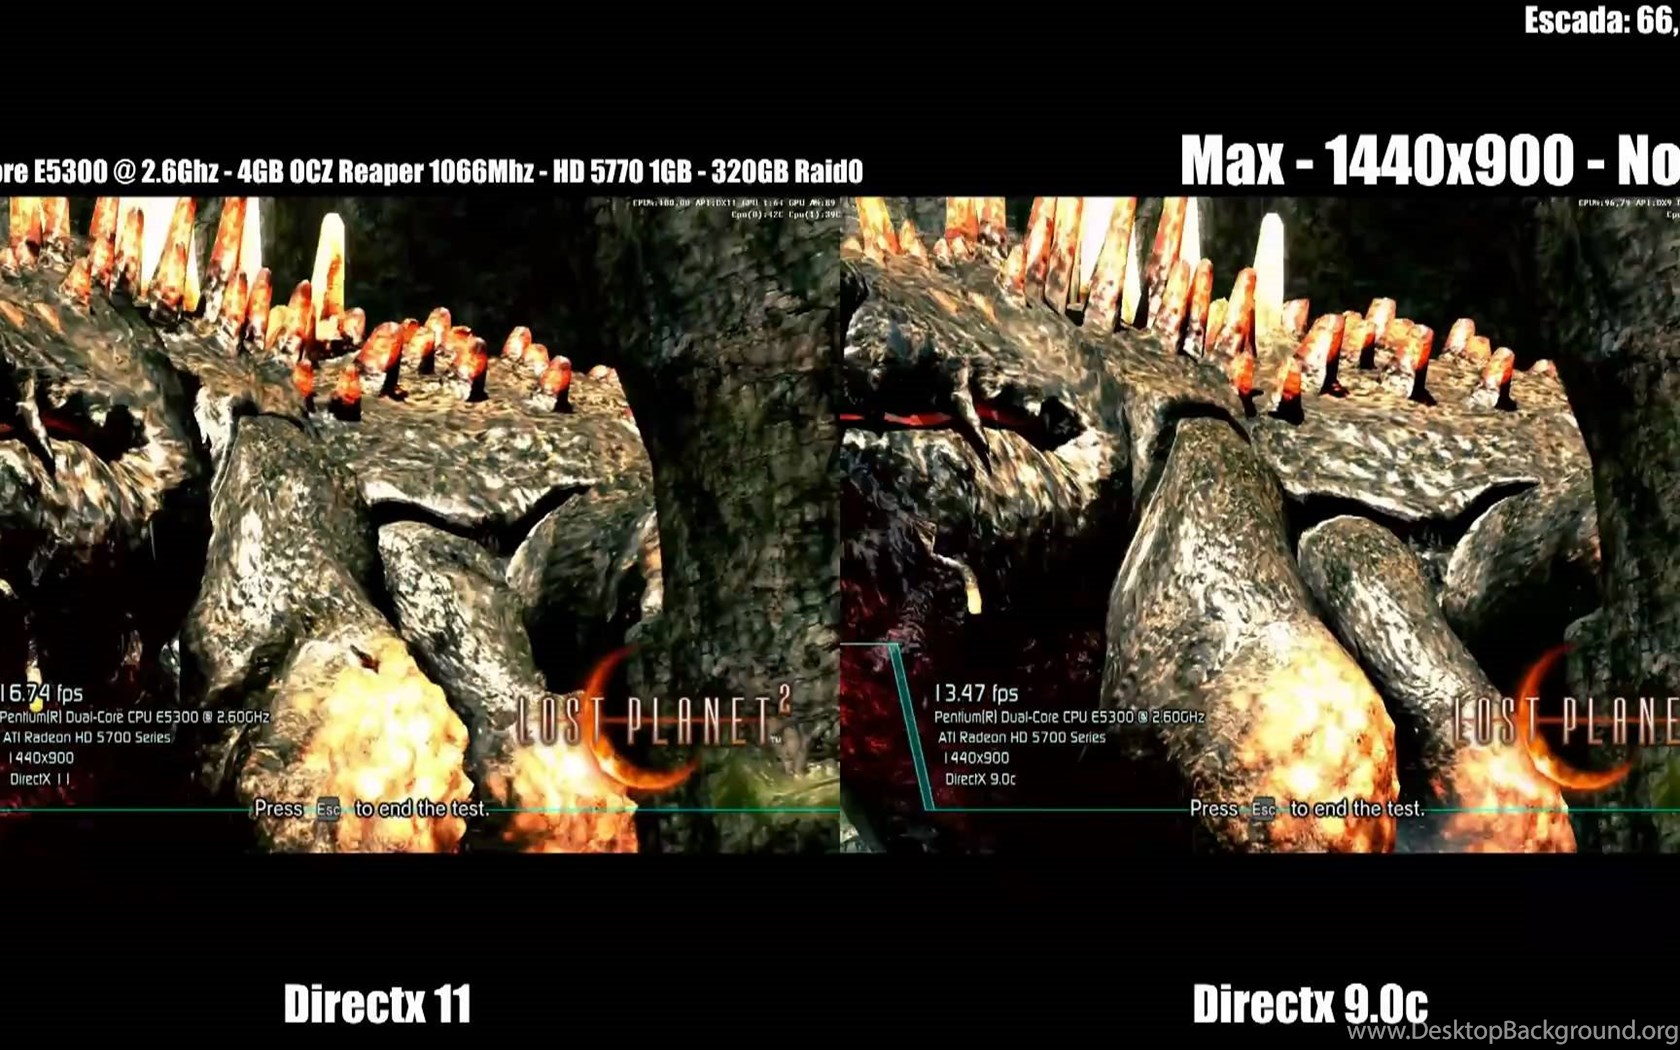 directx 9 0 c download